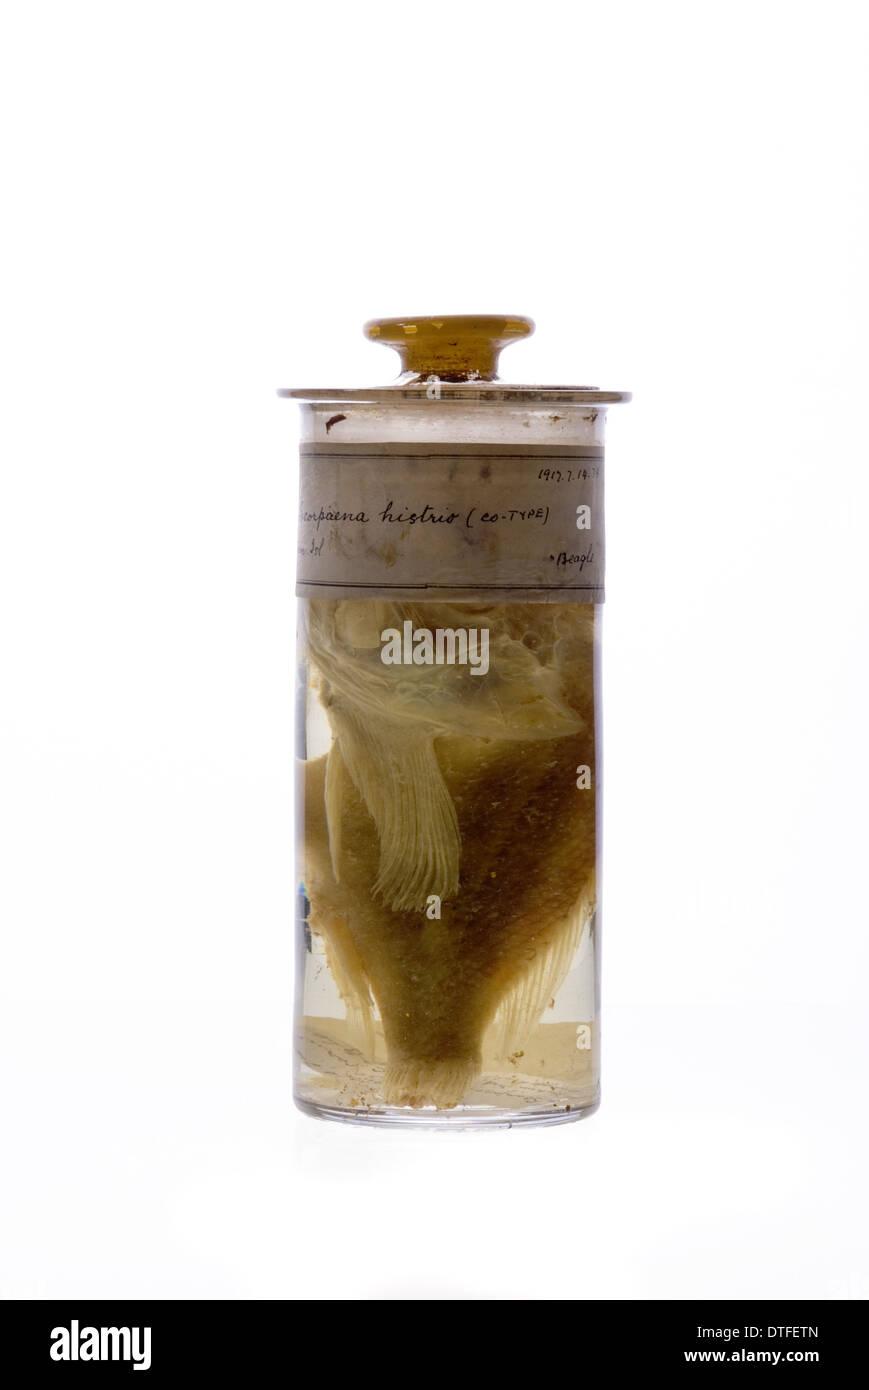 Scorpaena histrio, player scorpionfish - Stock Image